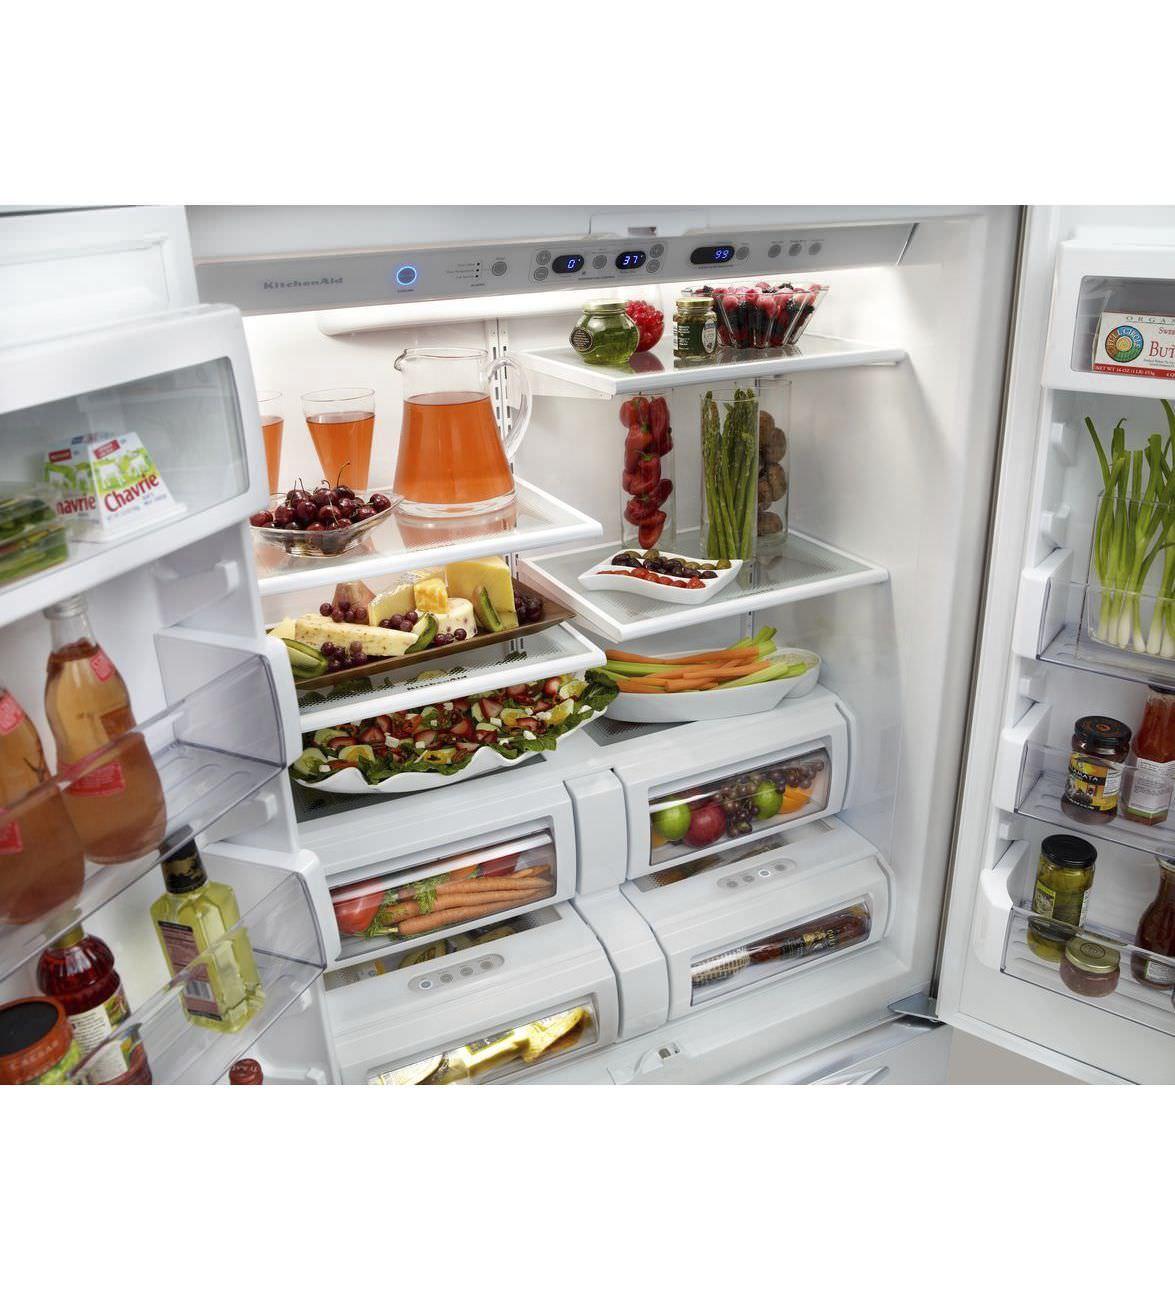 American refrigerator / white / built-in - KBFO42FTX - KitchenAid